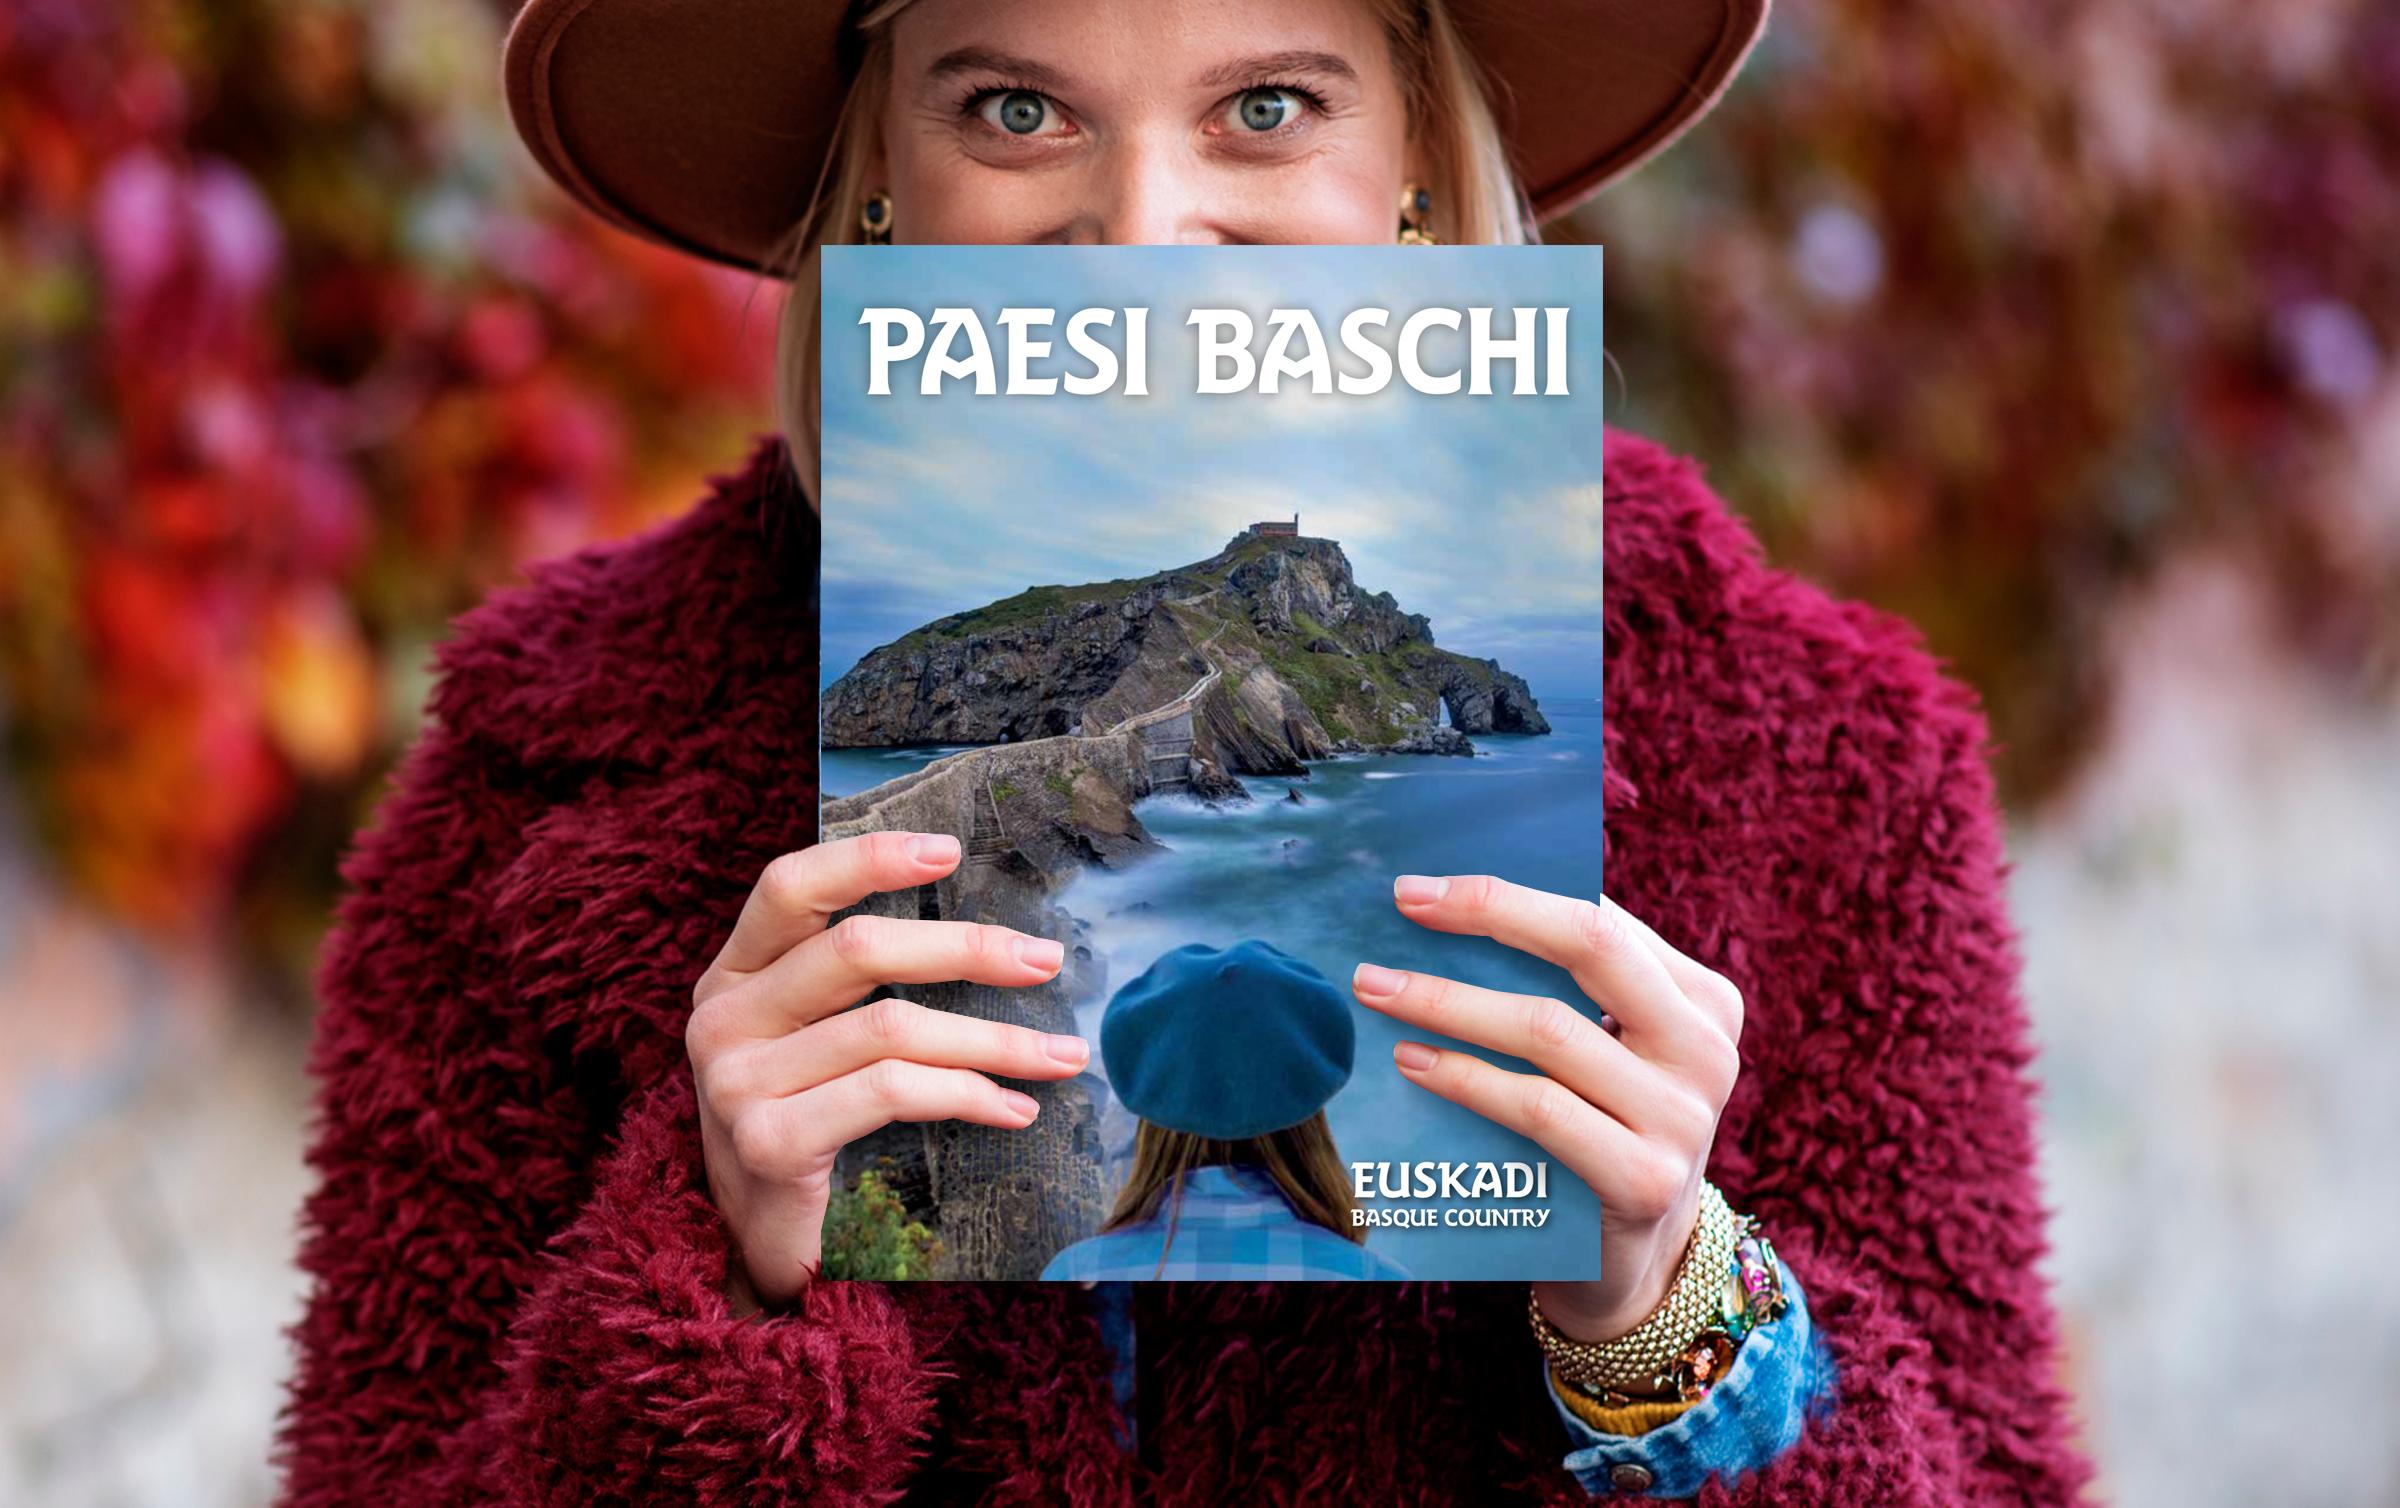 Turismoko katalogo orokorra italieraz